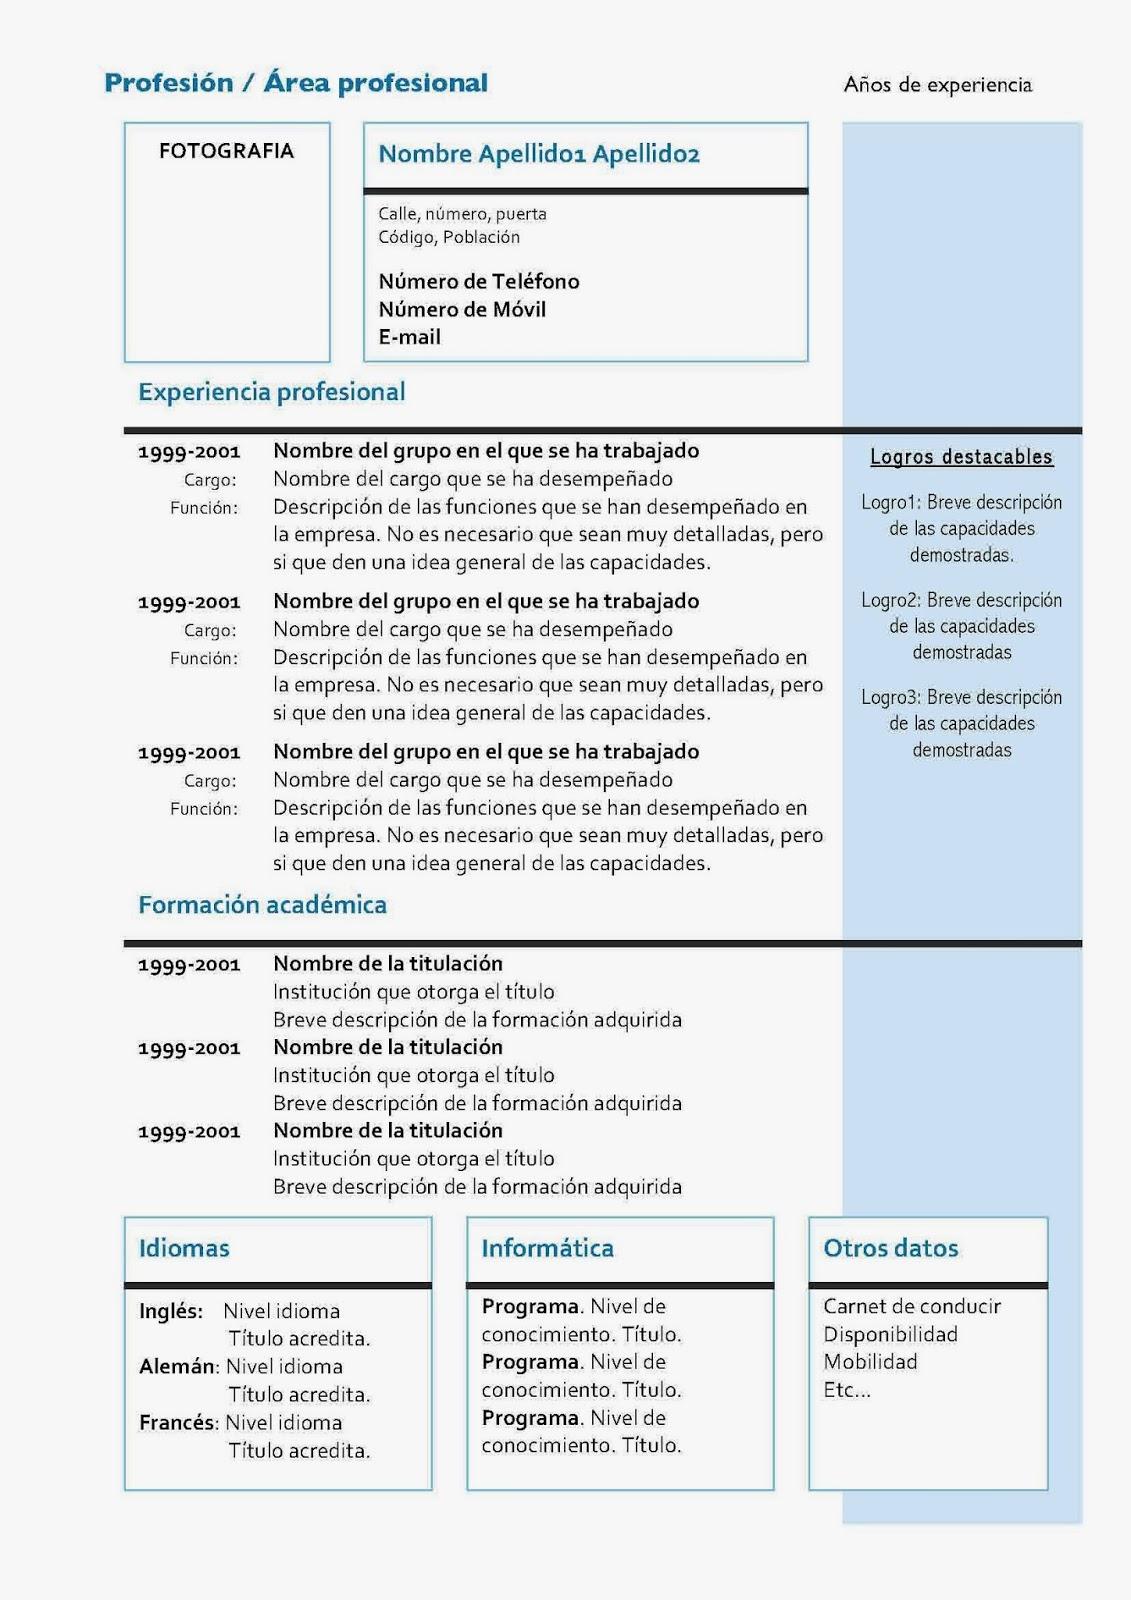 FOL TAFAD: Elaborar un Currículum vitae